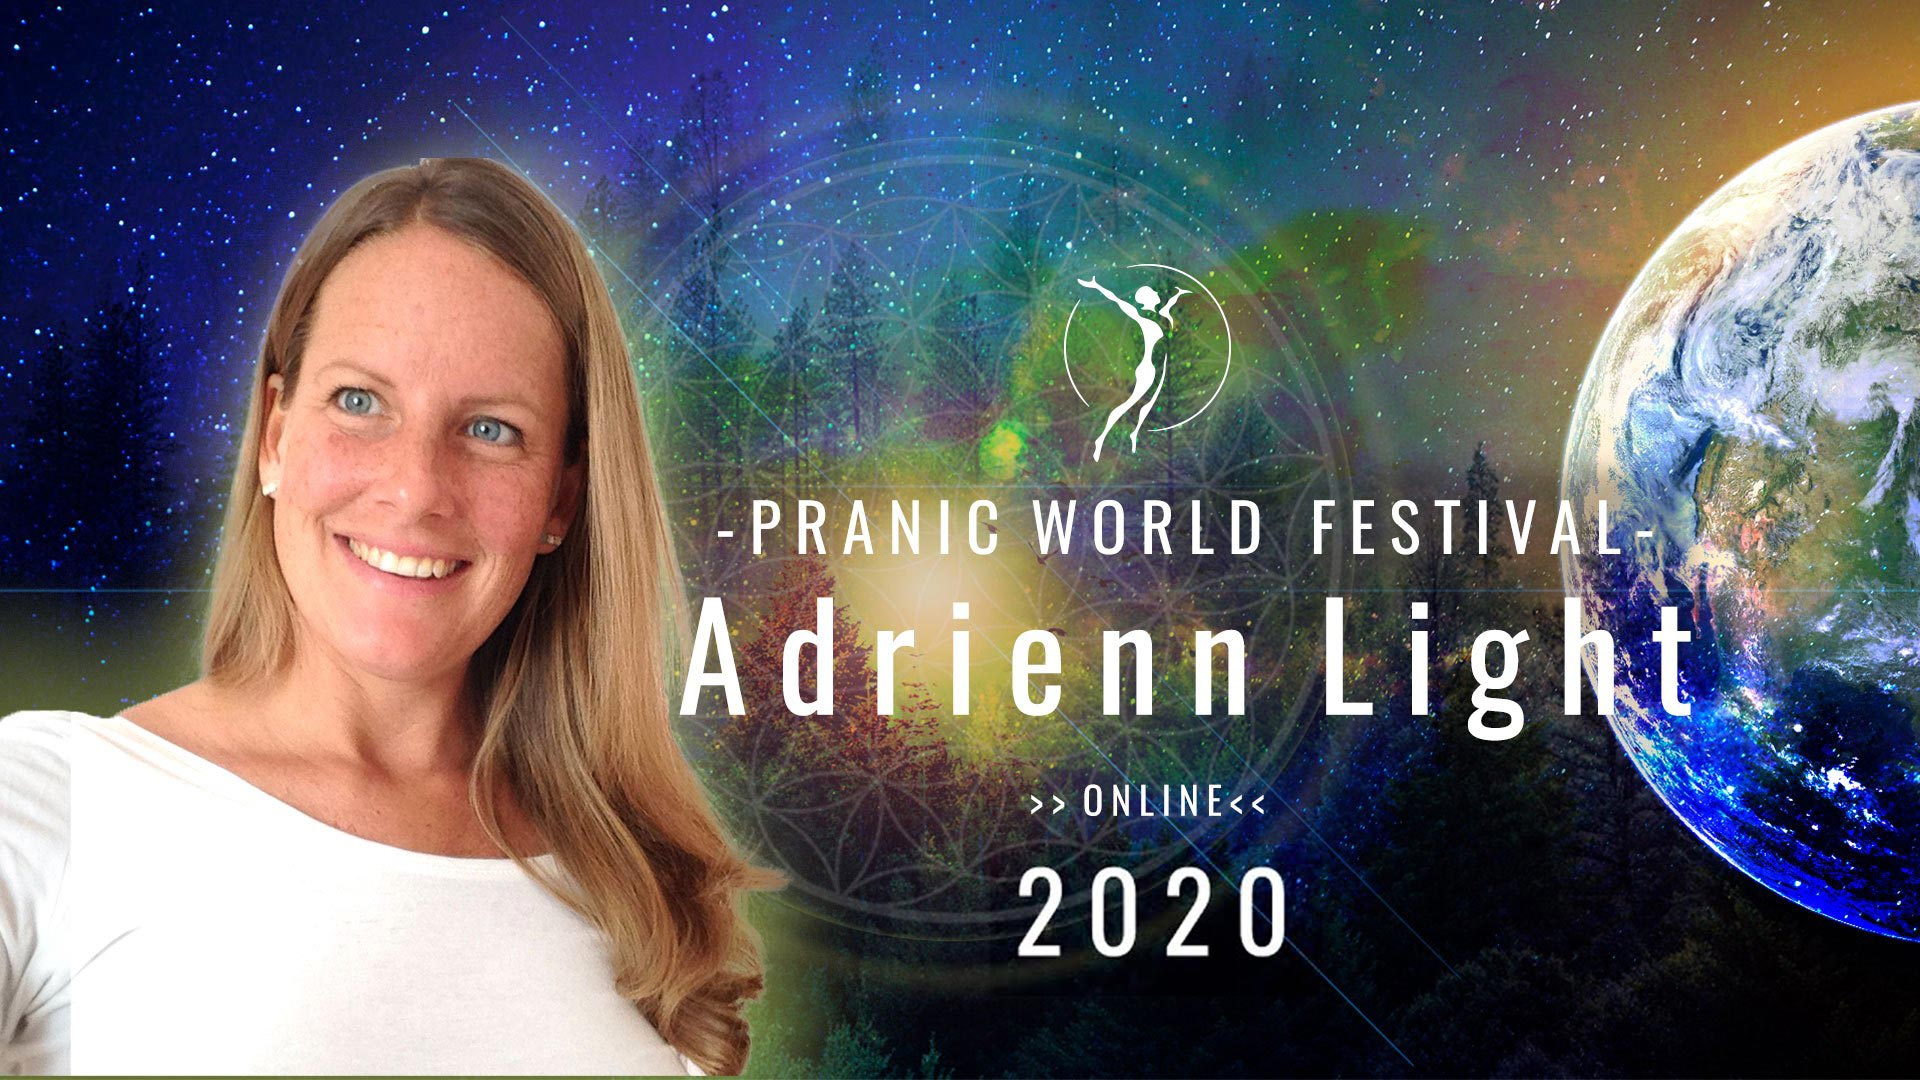 adrienn light